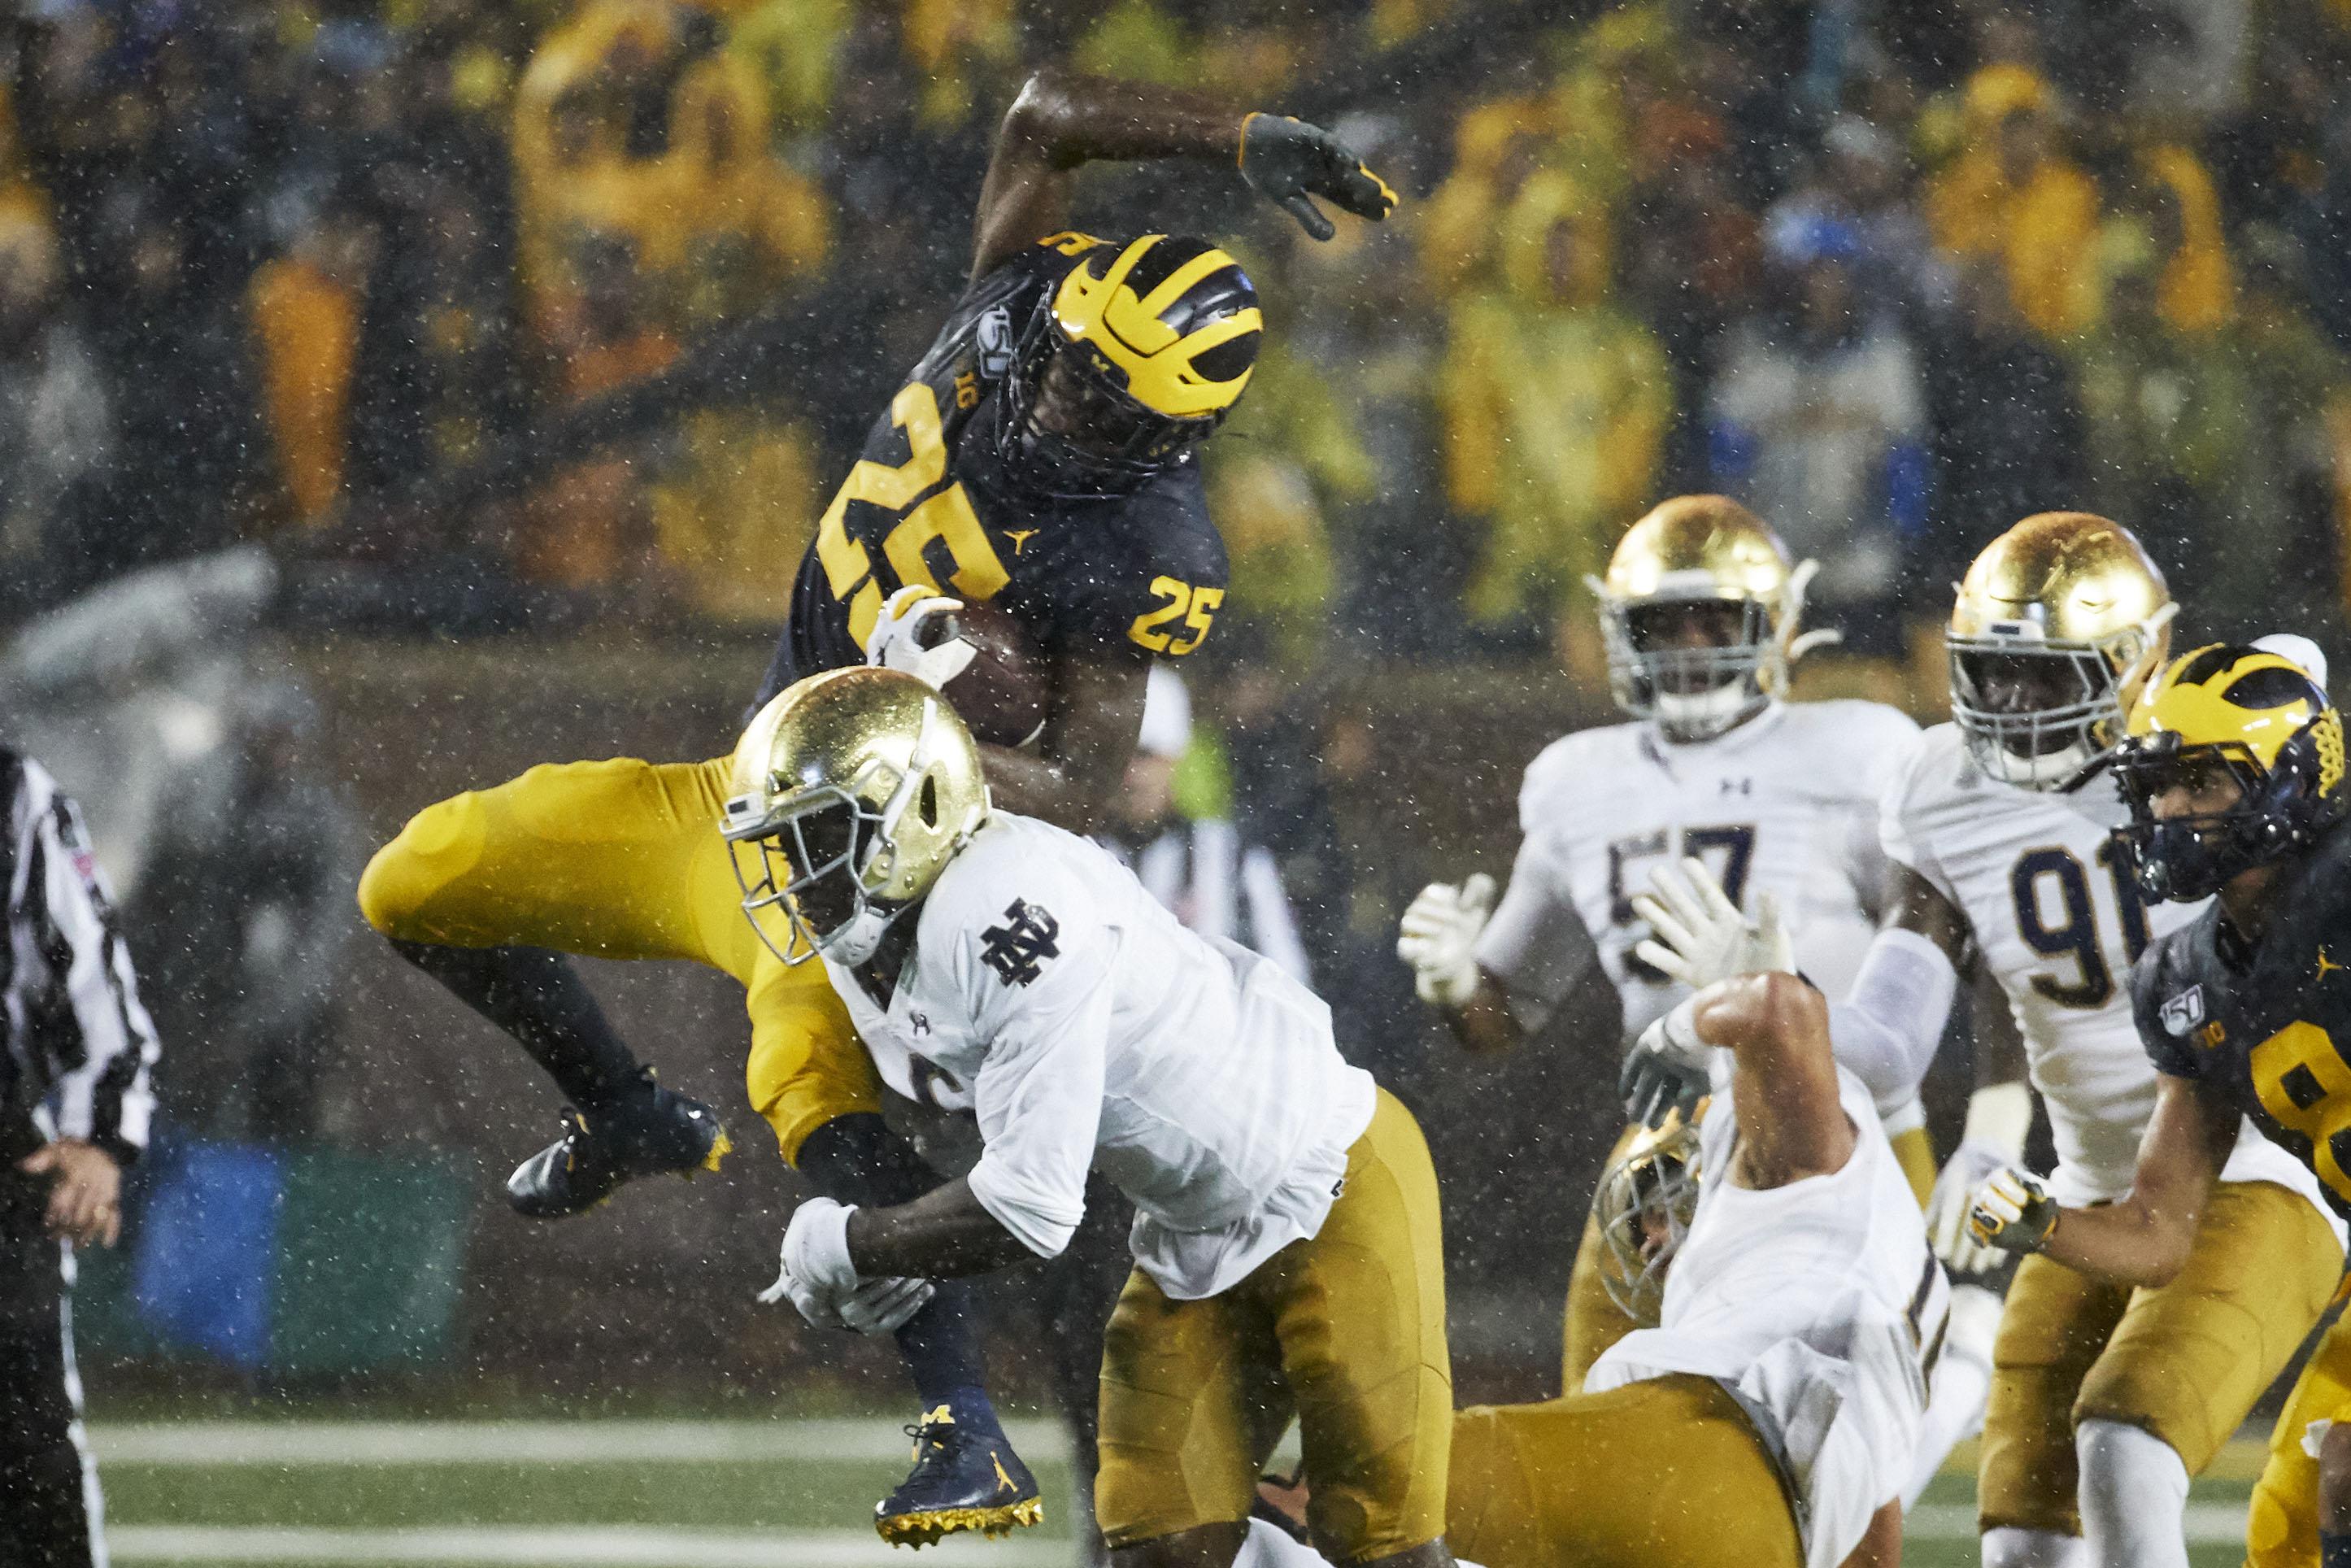 Michigan Wolverines running back Hassan Haskins (25) leaps over Notre Dame Fighting Irish linebacker Jeremiah Owusu-Koramoah (6) in the first half at Michigan Stadium.